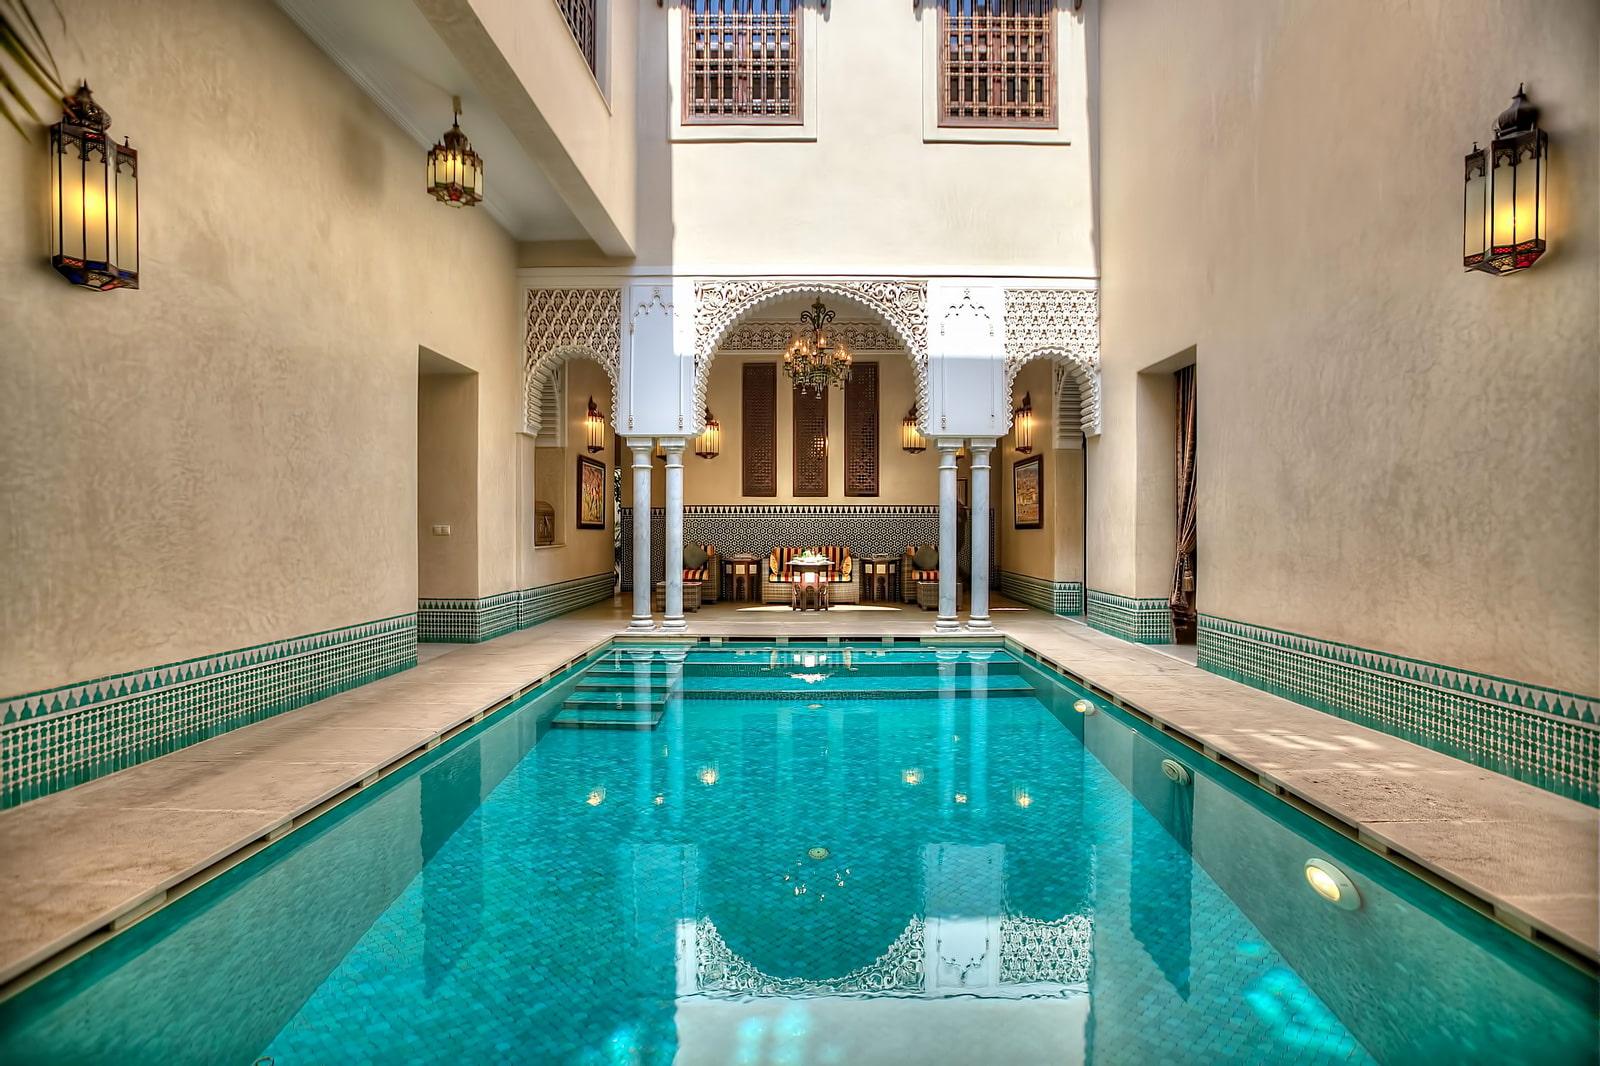 Traditional Moorish architecture